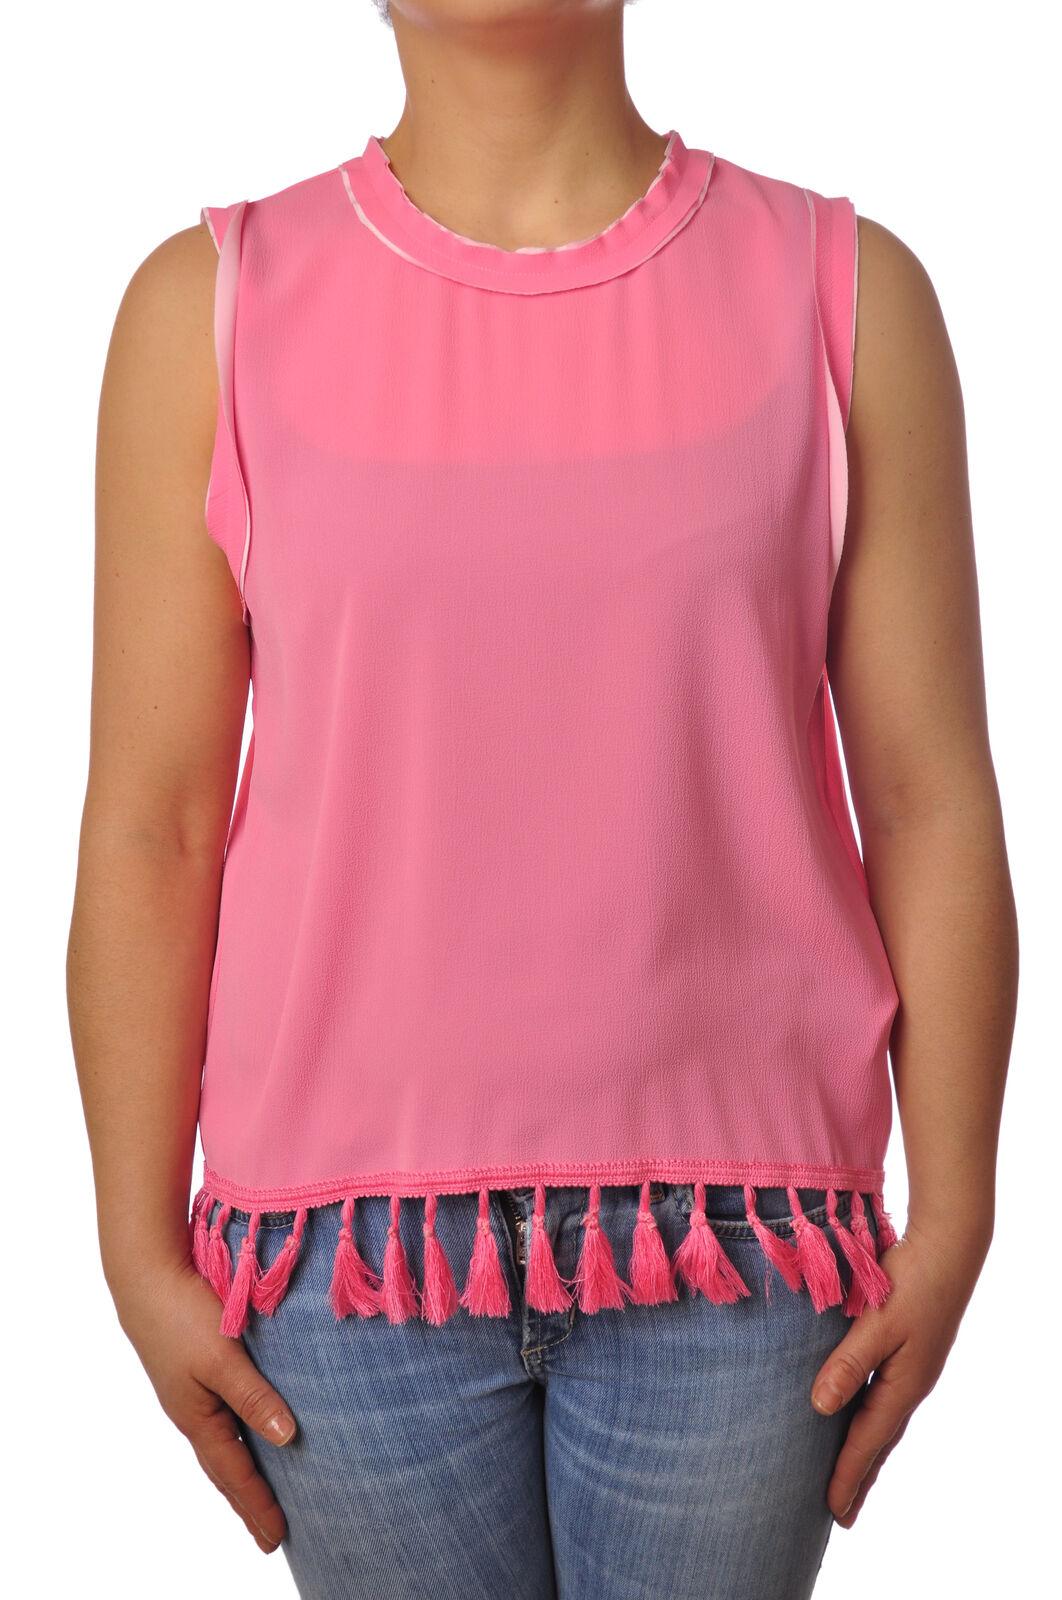 Traffic People - Topwear-Sleeveless Top - Woman - Pink - 5110616C184342